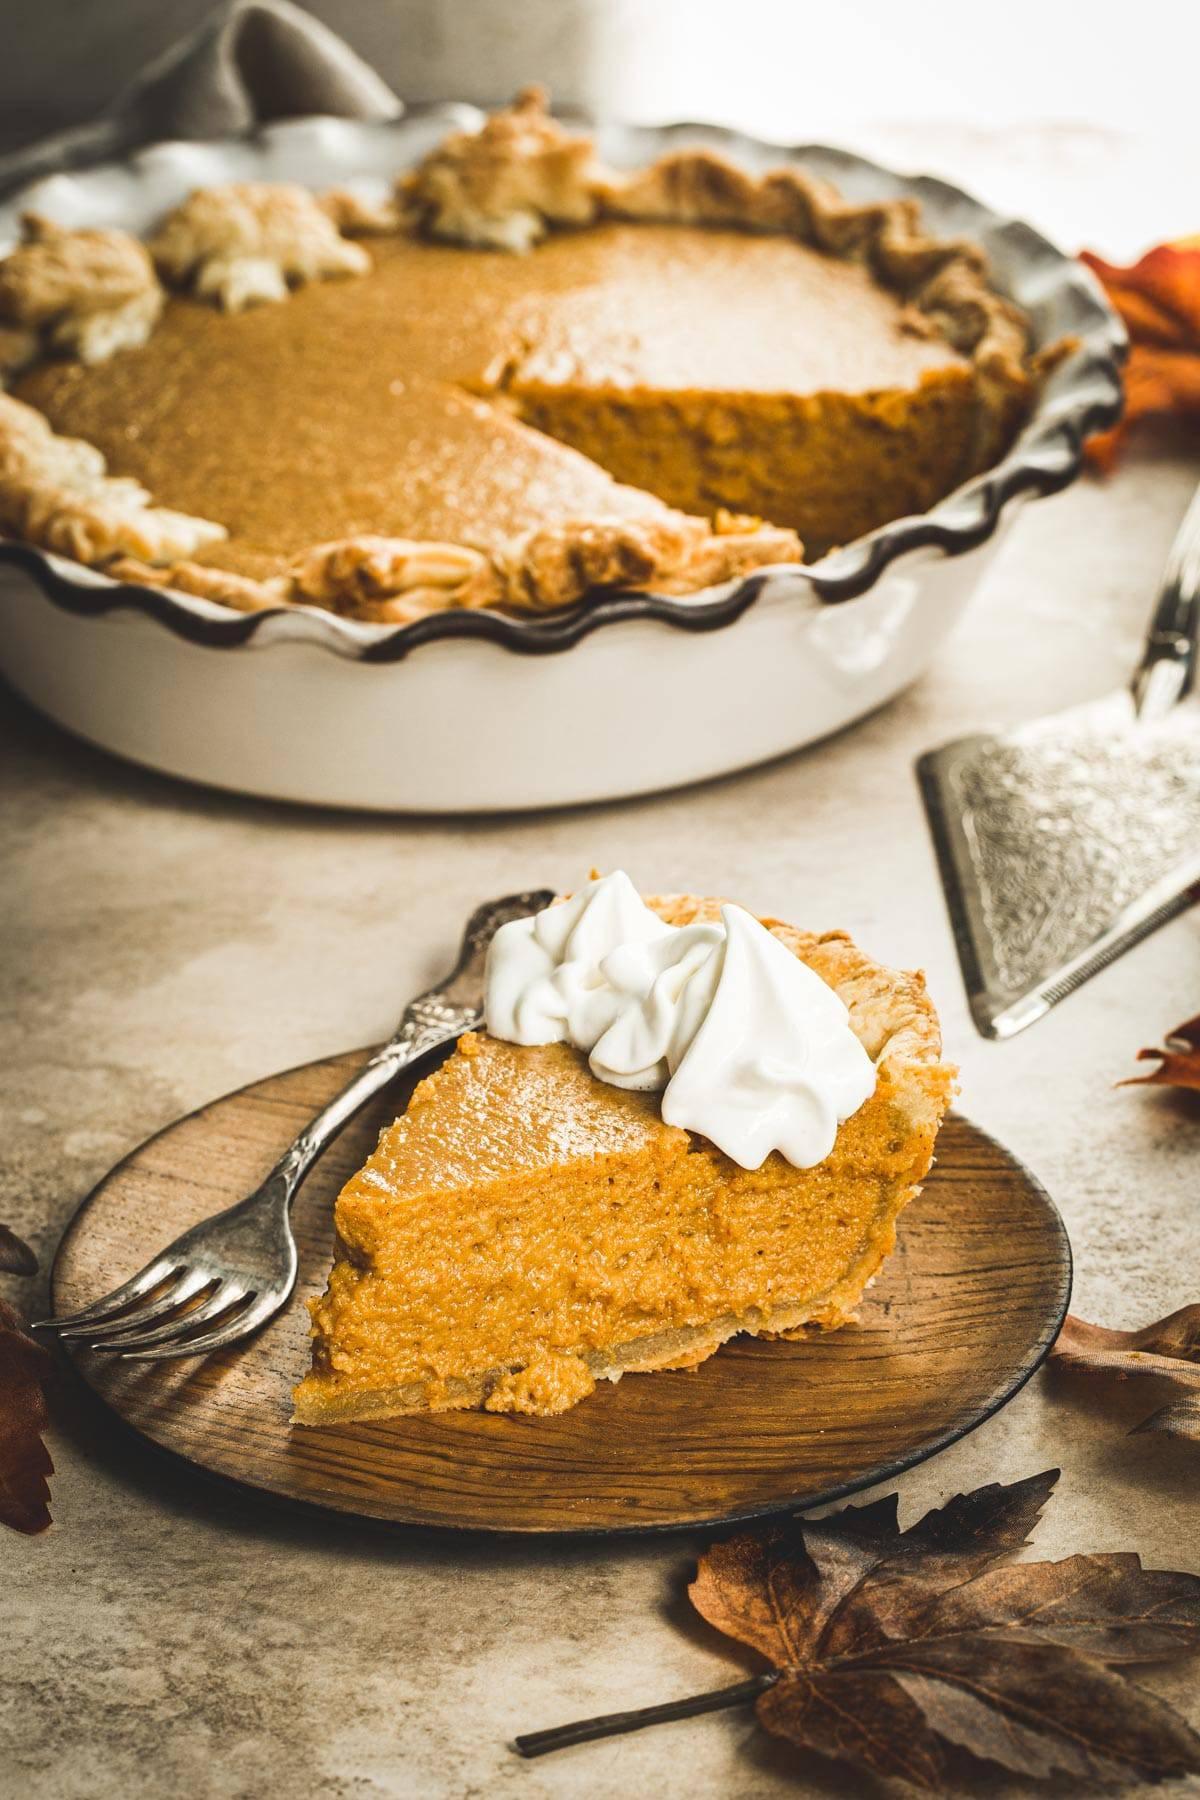 Slice of maple pumpkin pie.